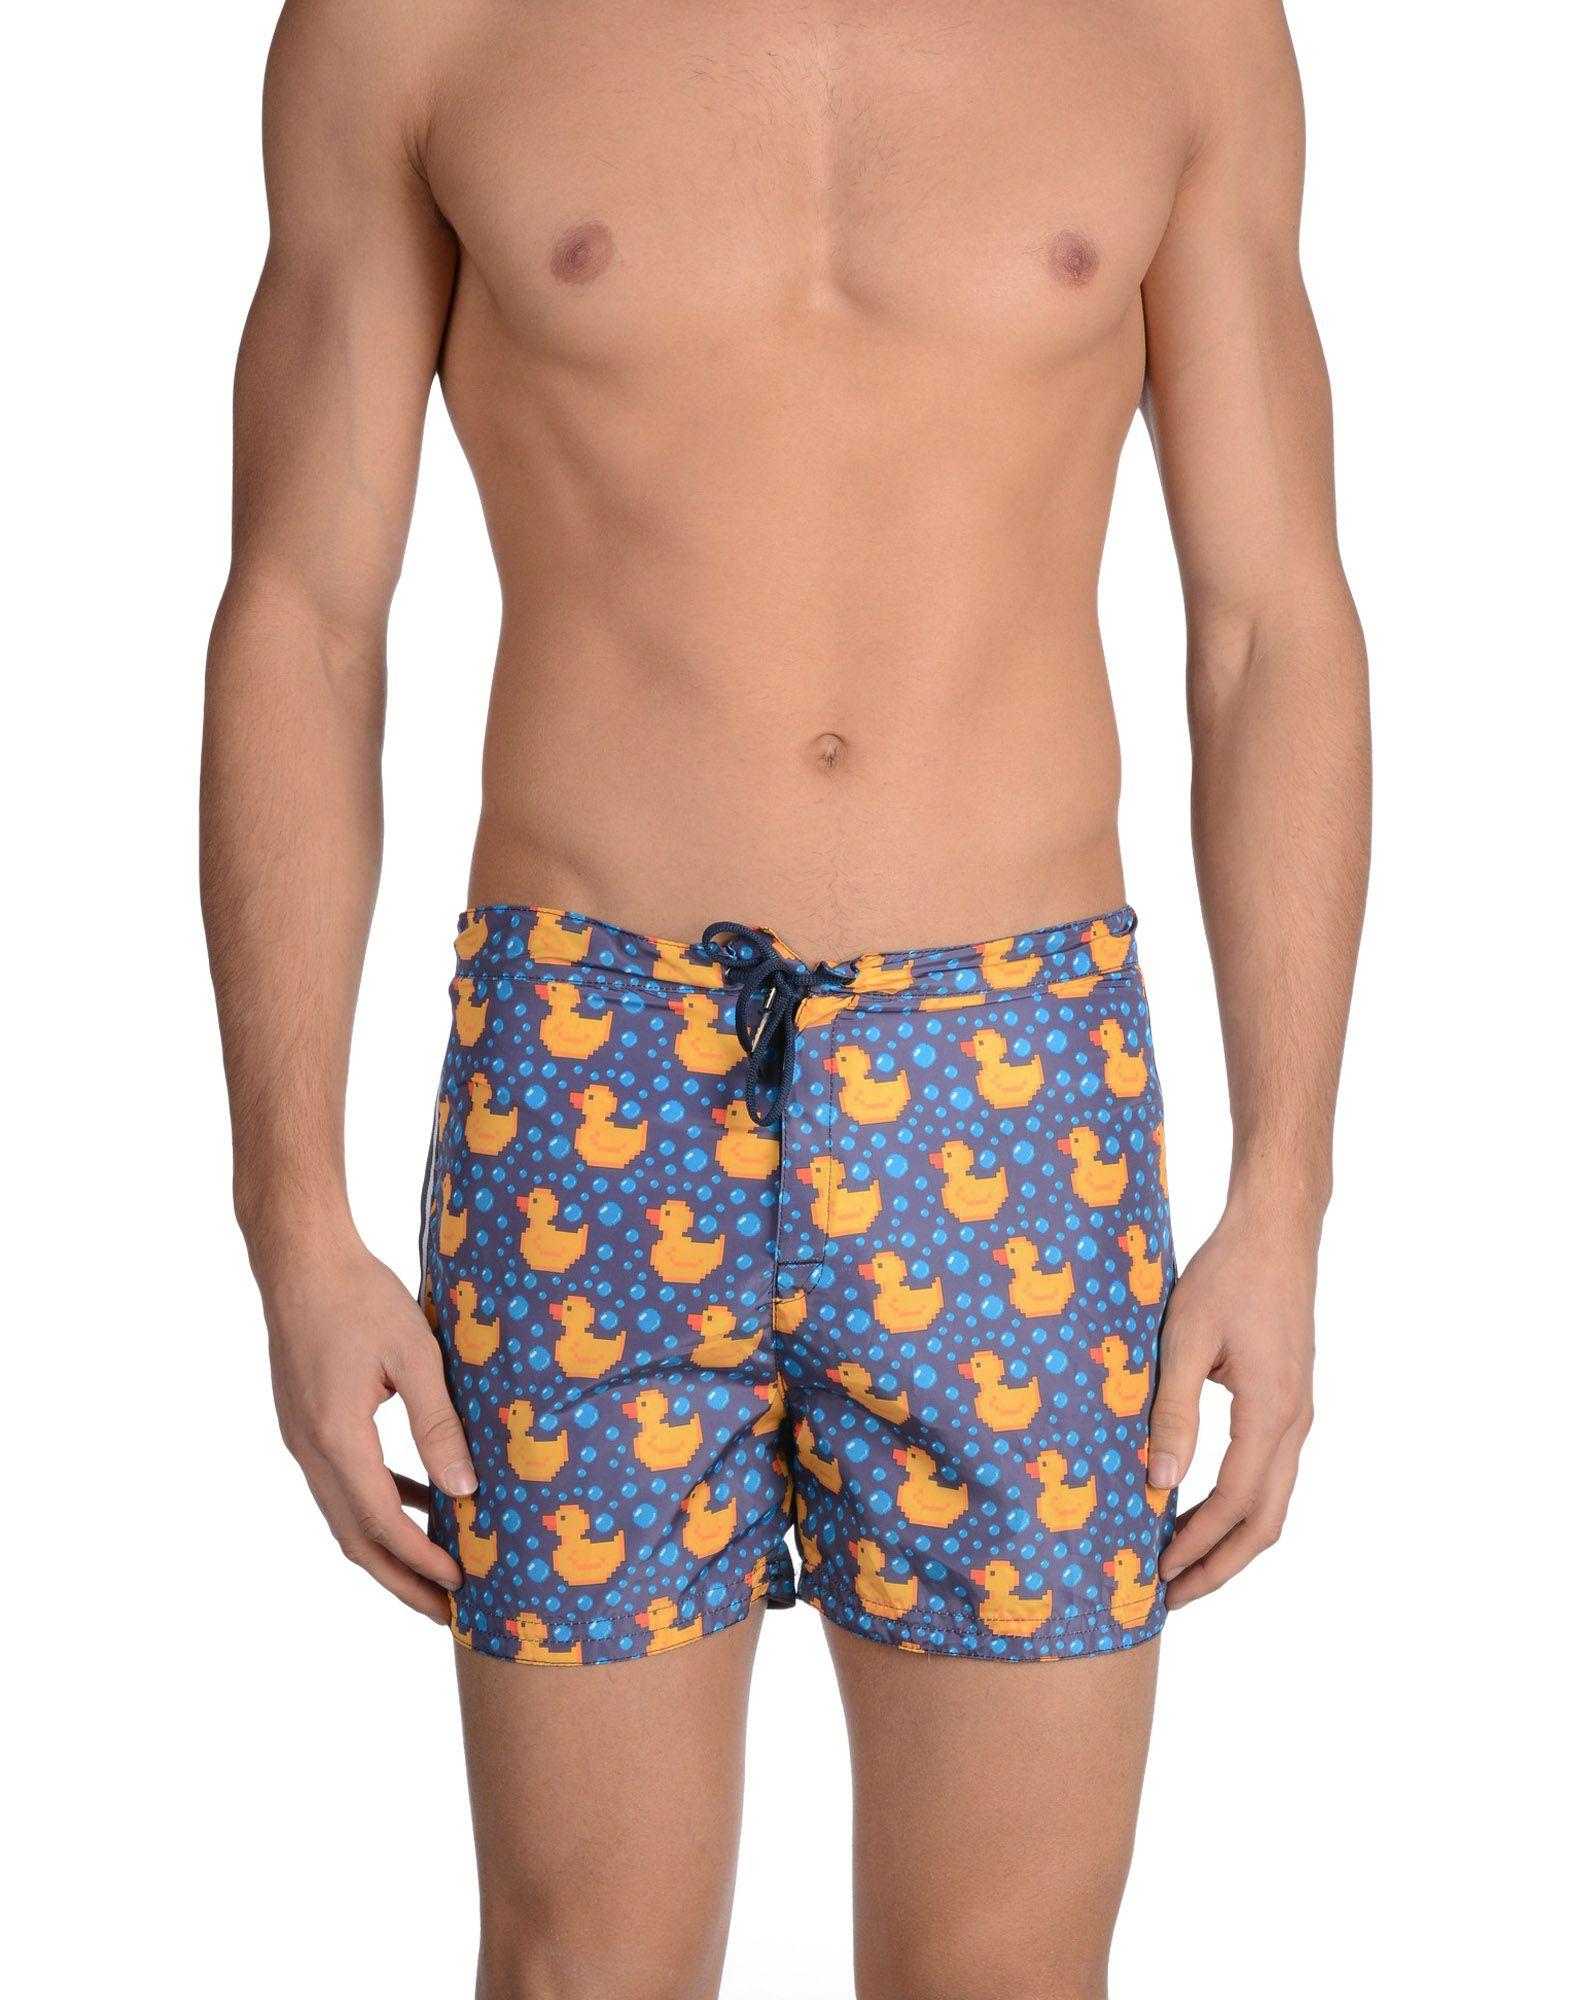 MENTORE Swimming trunks